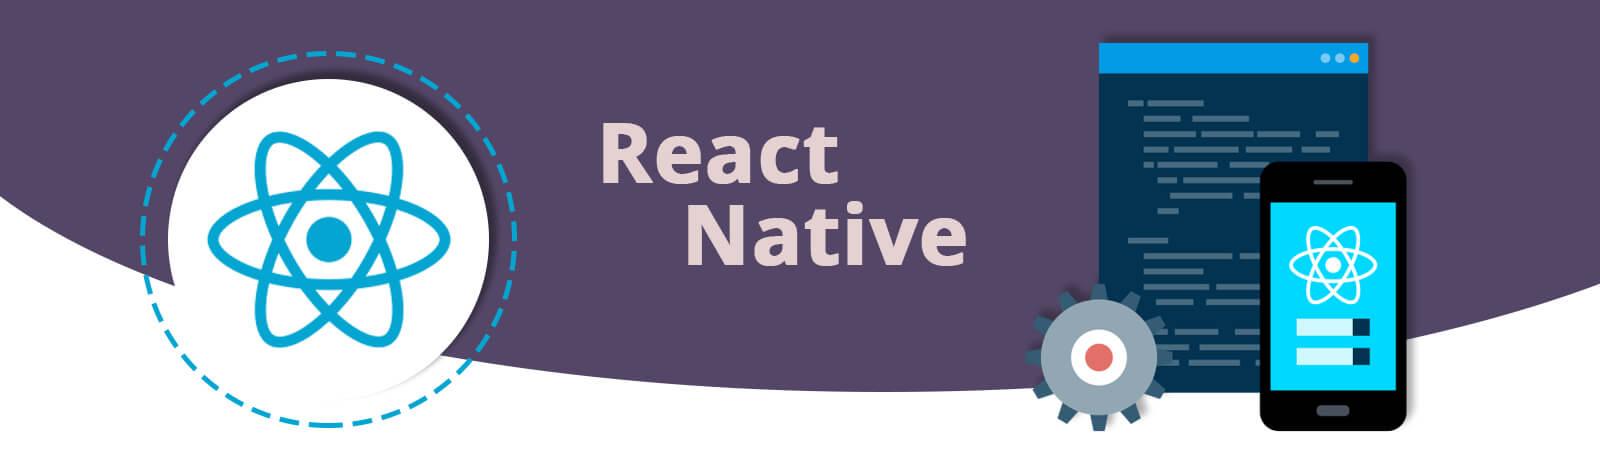 react-native-development-services